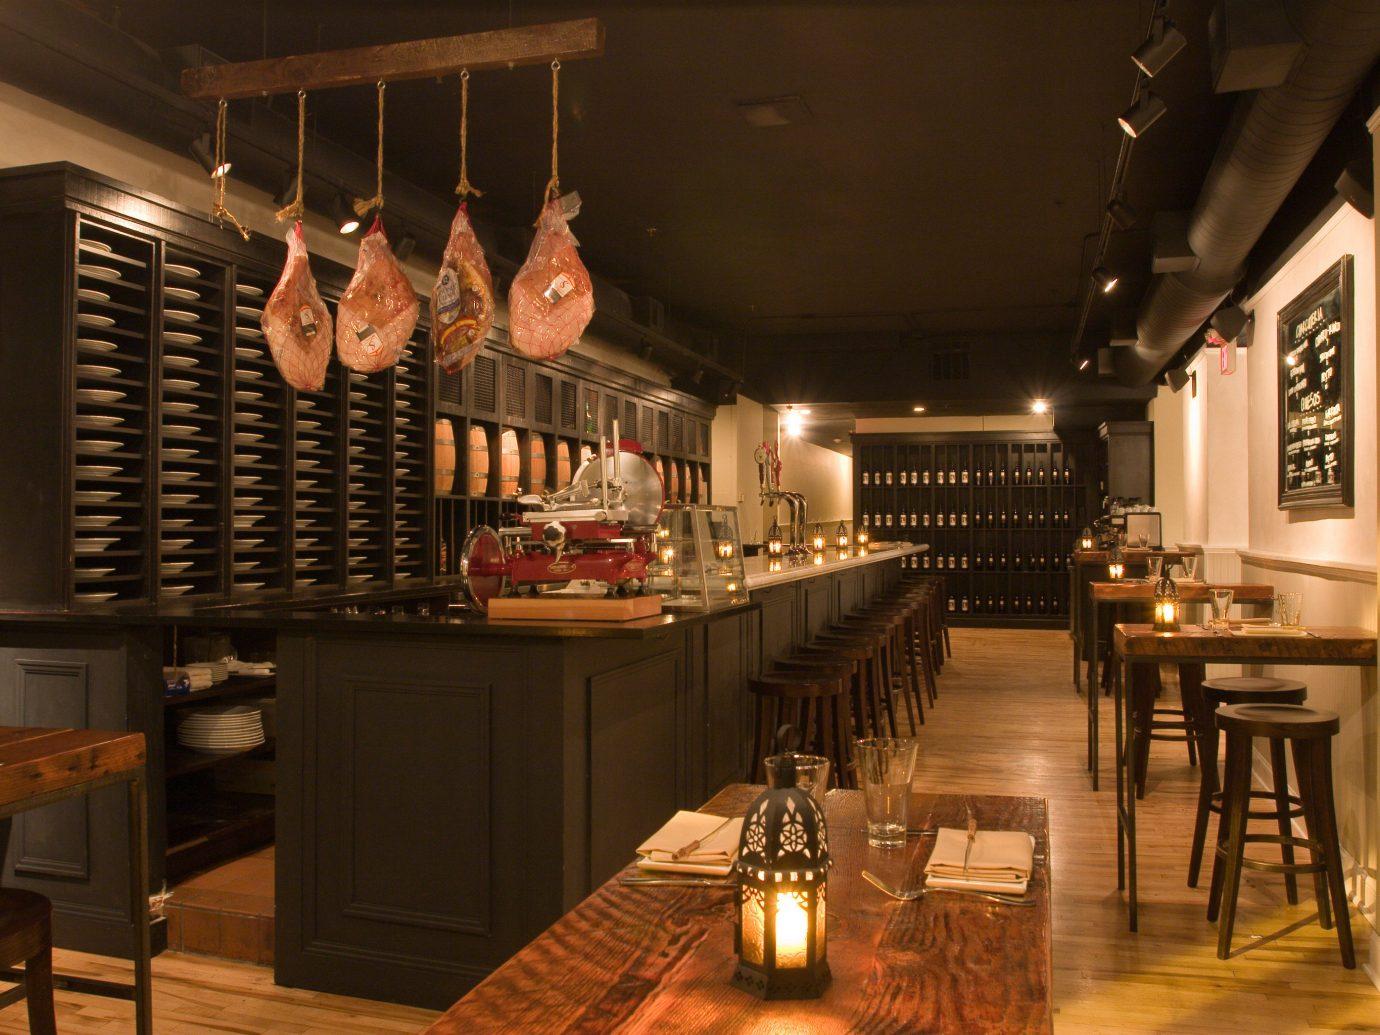 Food + Drink indoor ceiling table floor restaurant Bar meal café interior design cuisine